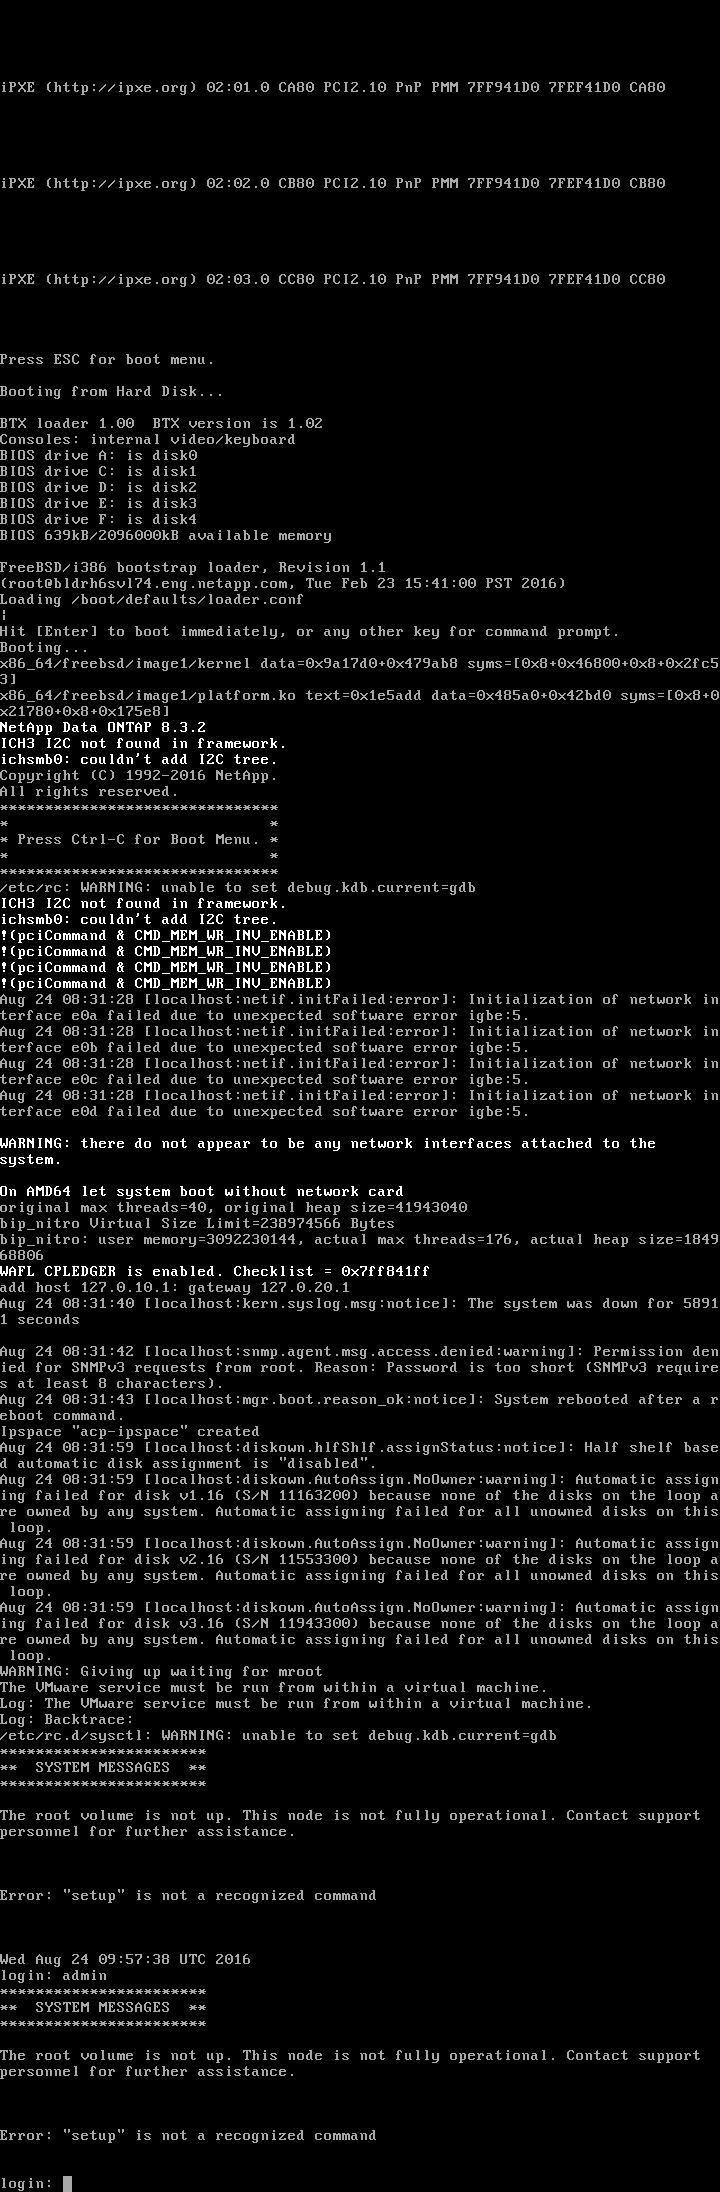 Simulator 8 3 2 - Login Data? - NetApp Community